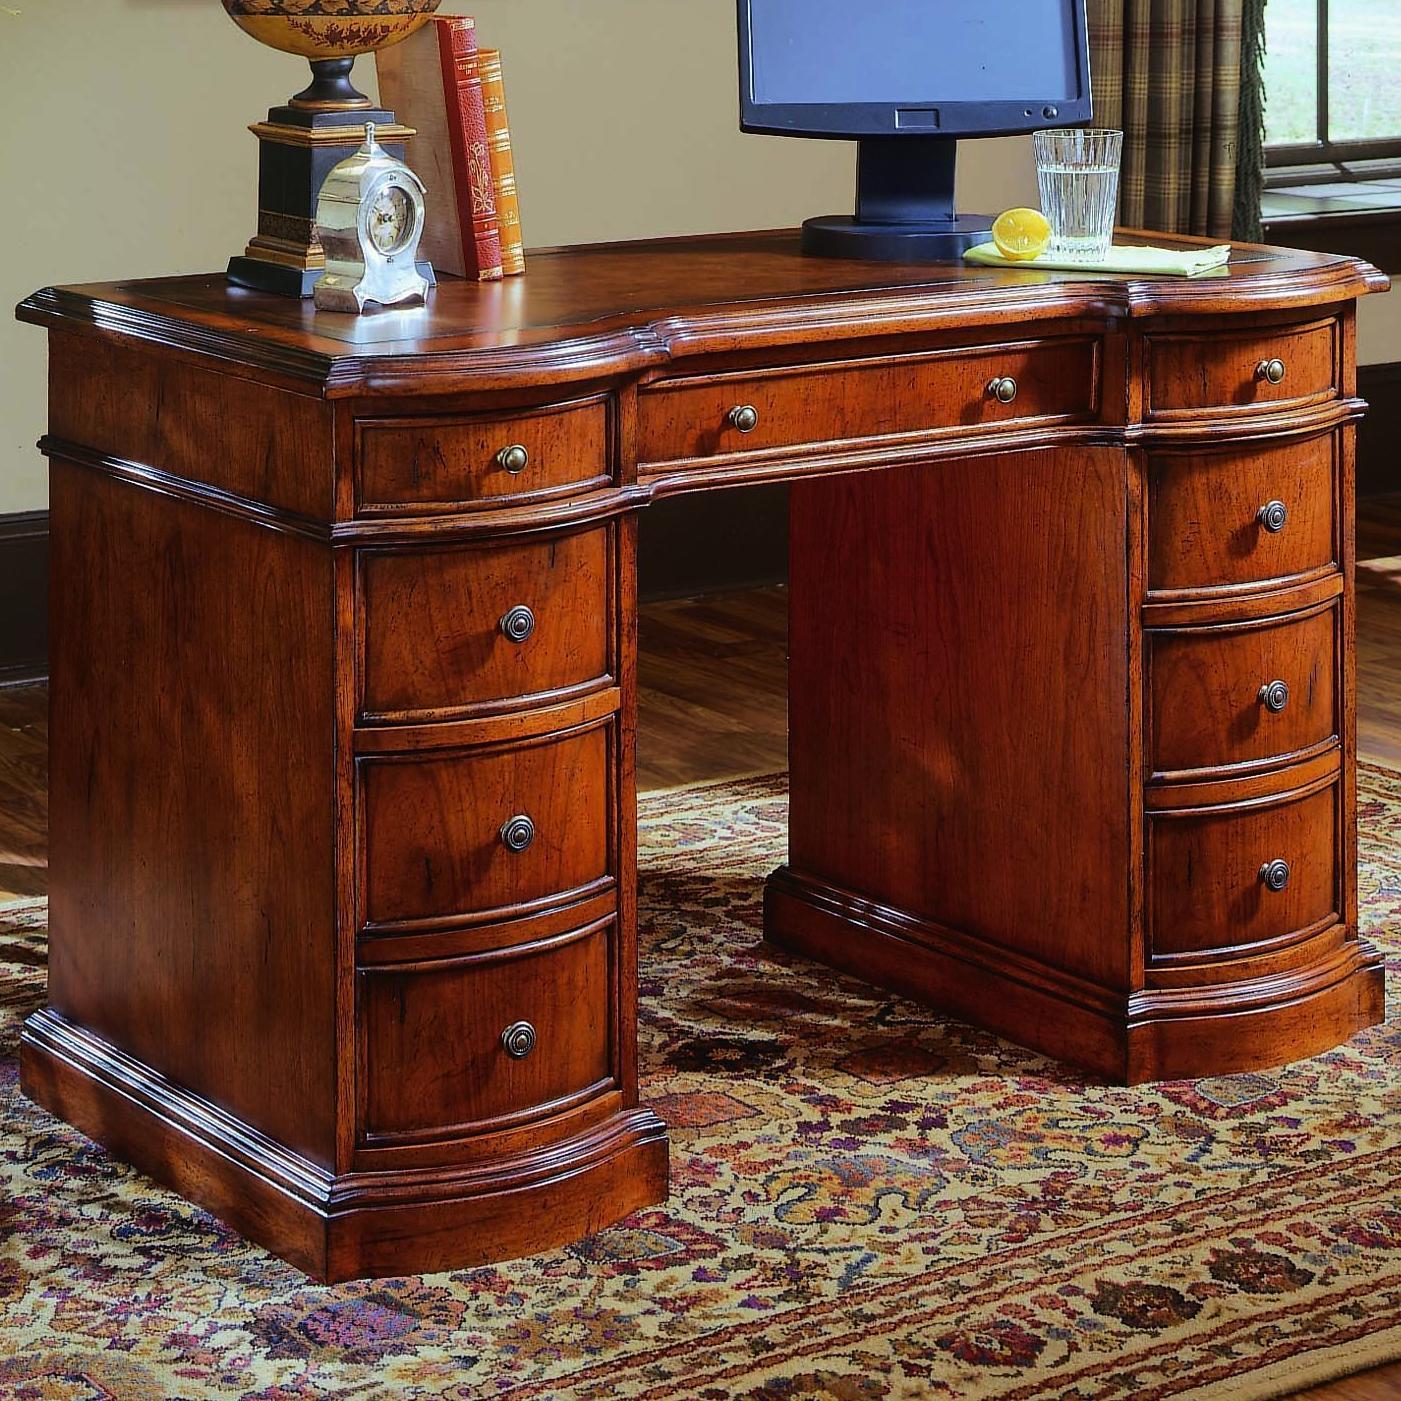 Hooker Furniture Small KneeHole Desks 29910301 Knee